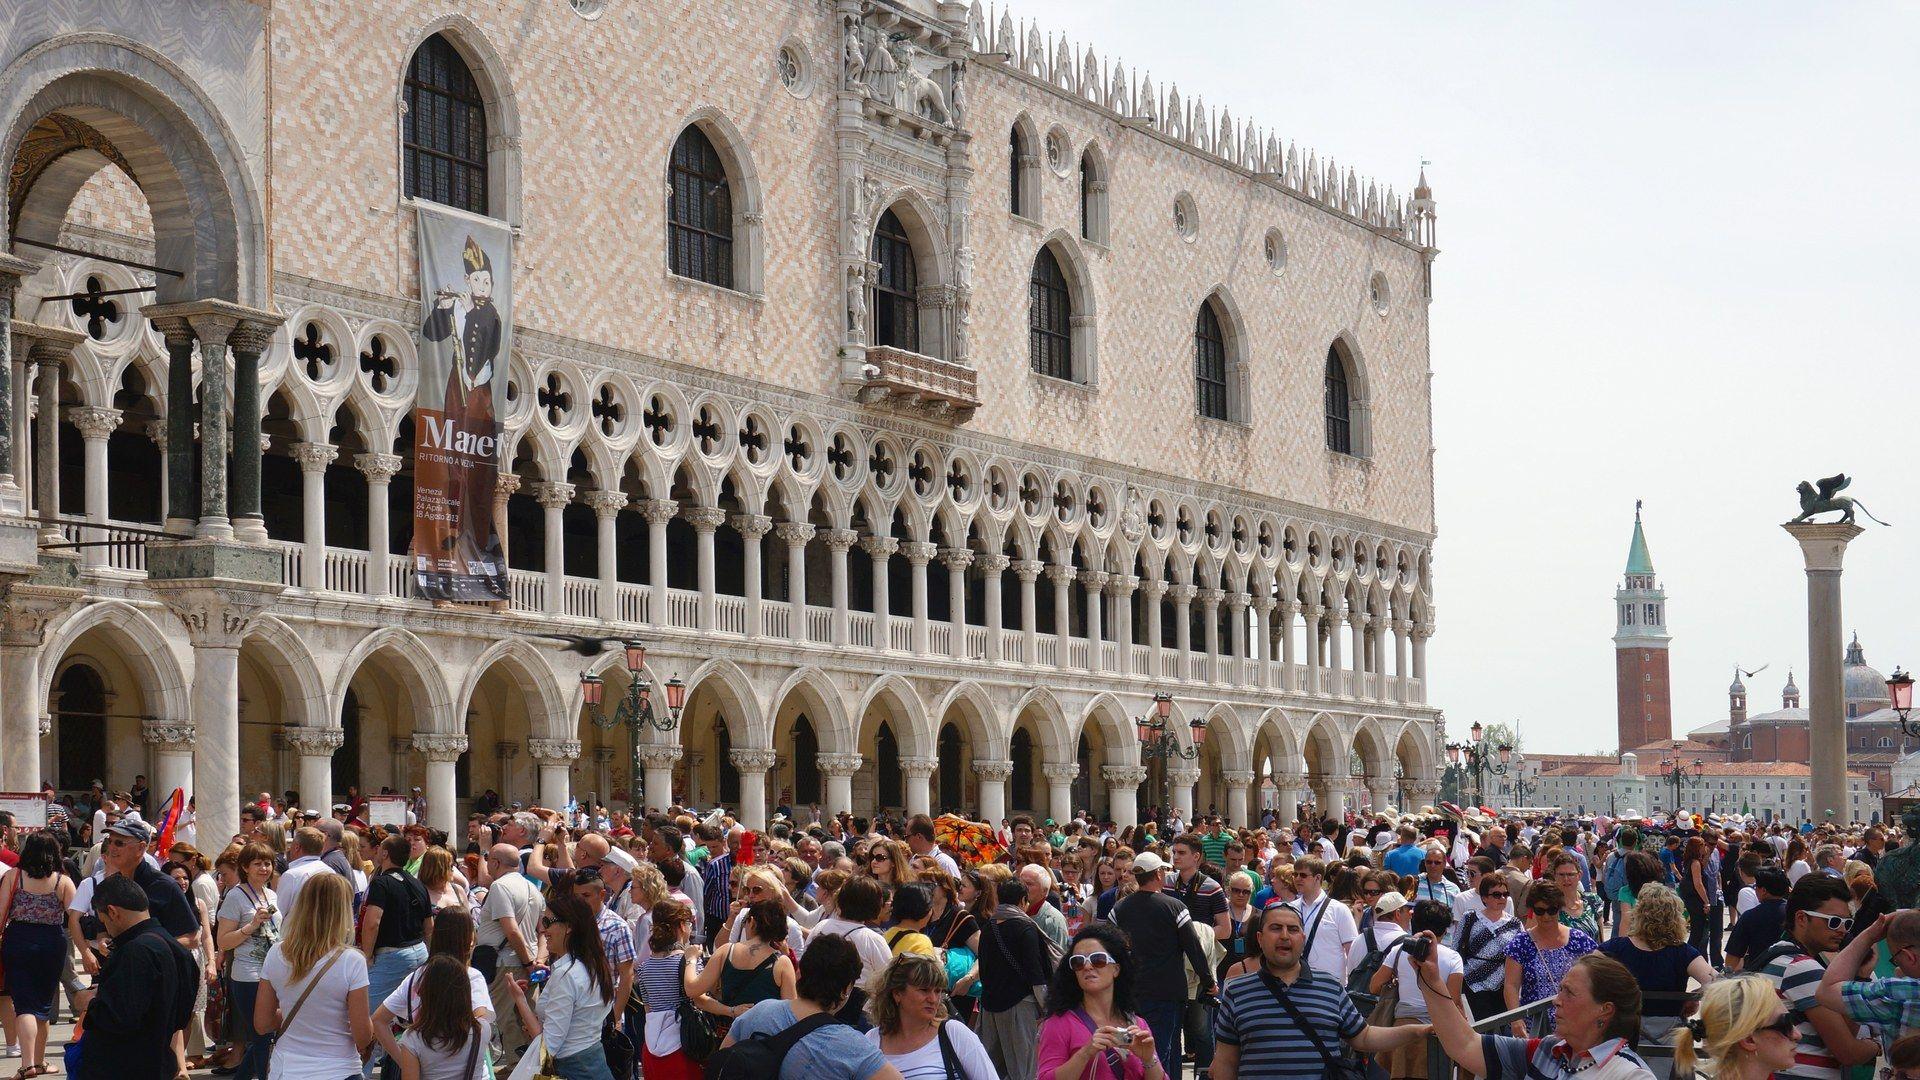 Venezia, via libera al ticket d'ingresso. Si paga da 3 a 8